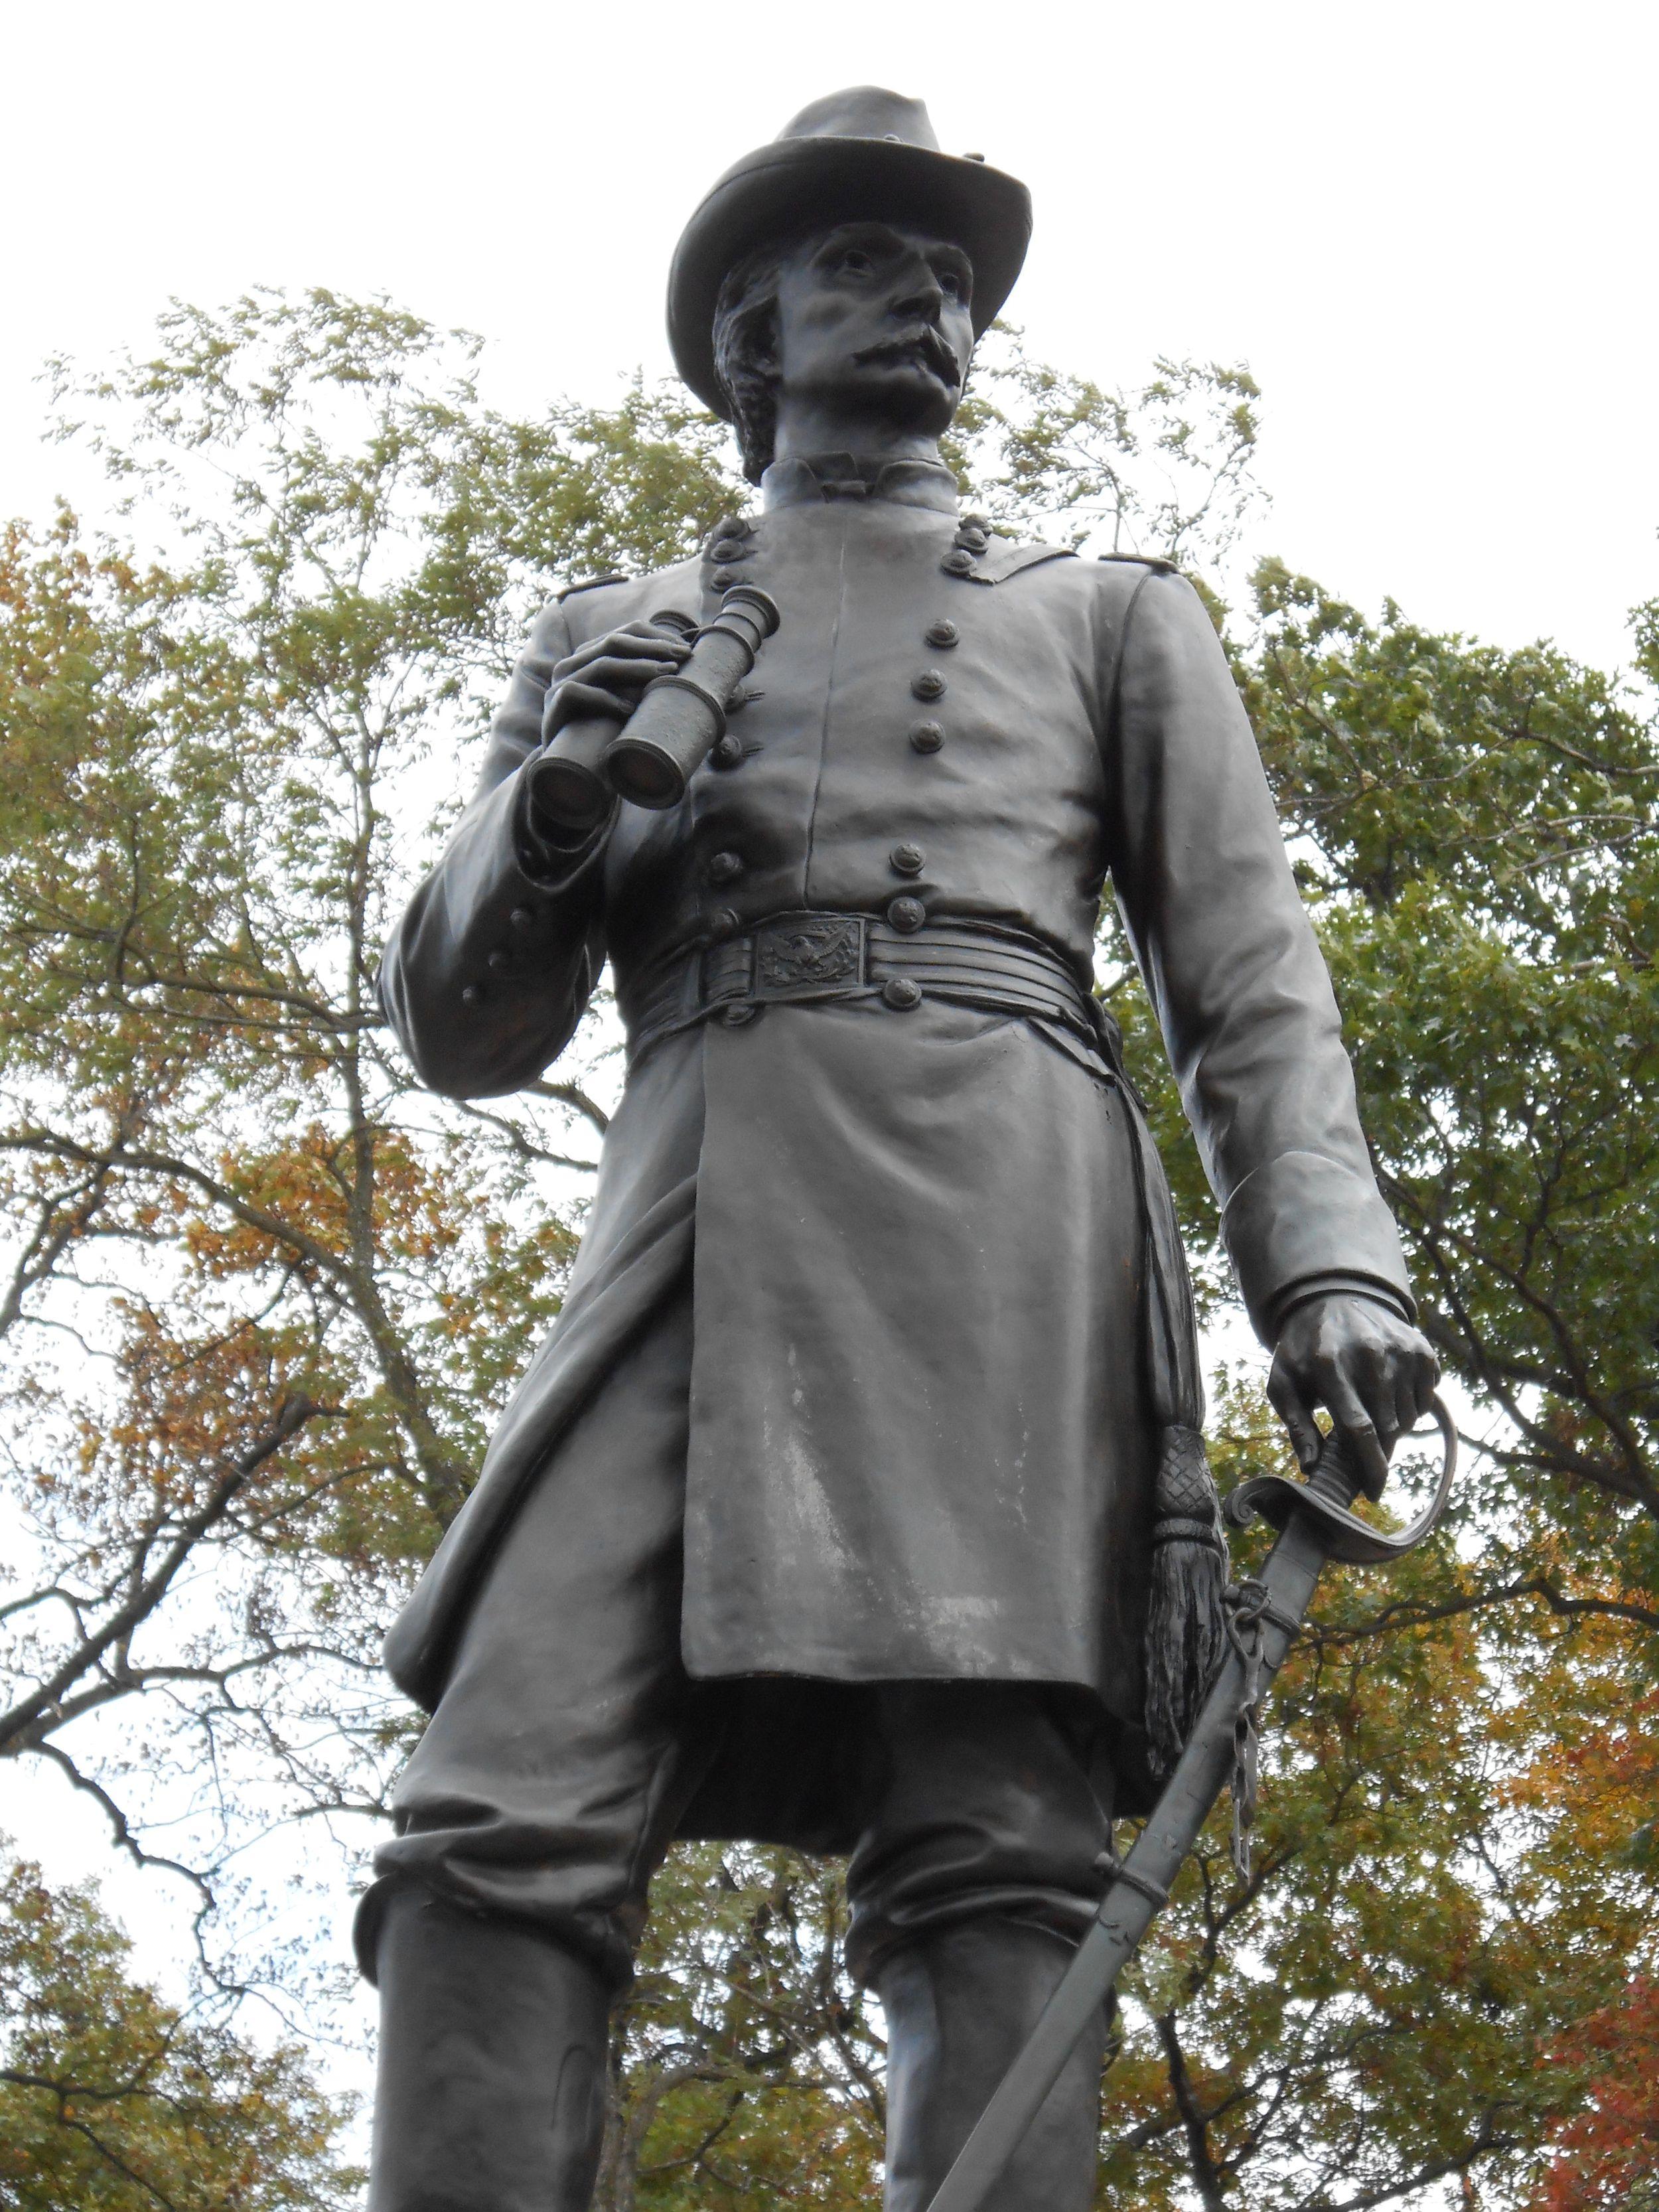 Statute of Warren on Little Round Top (photo by author)